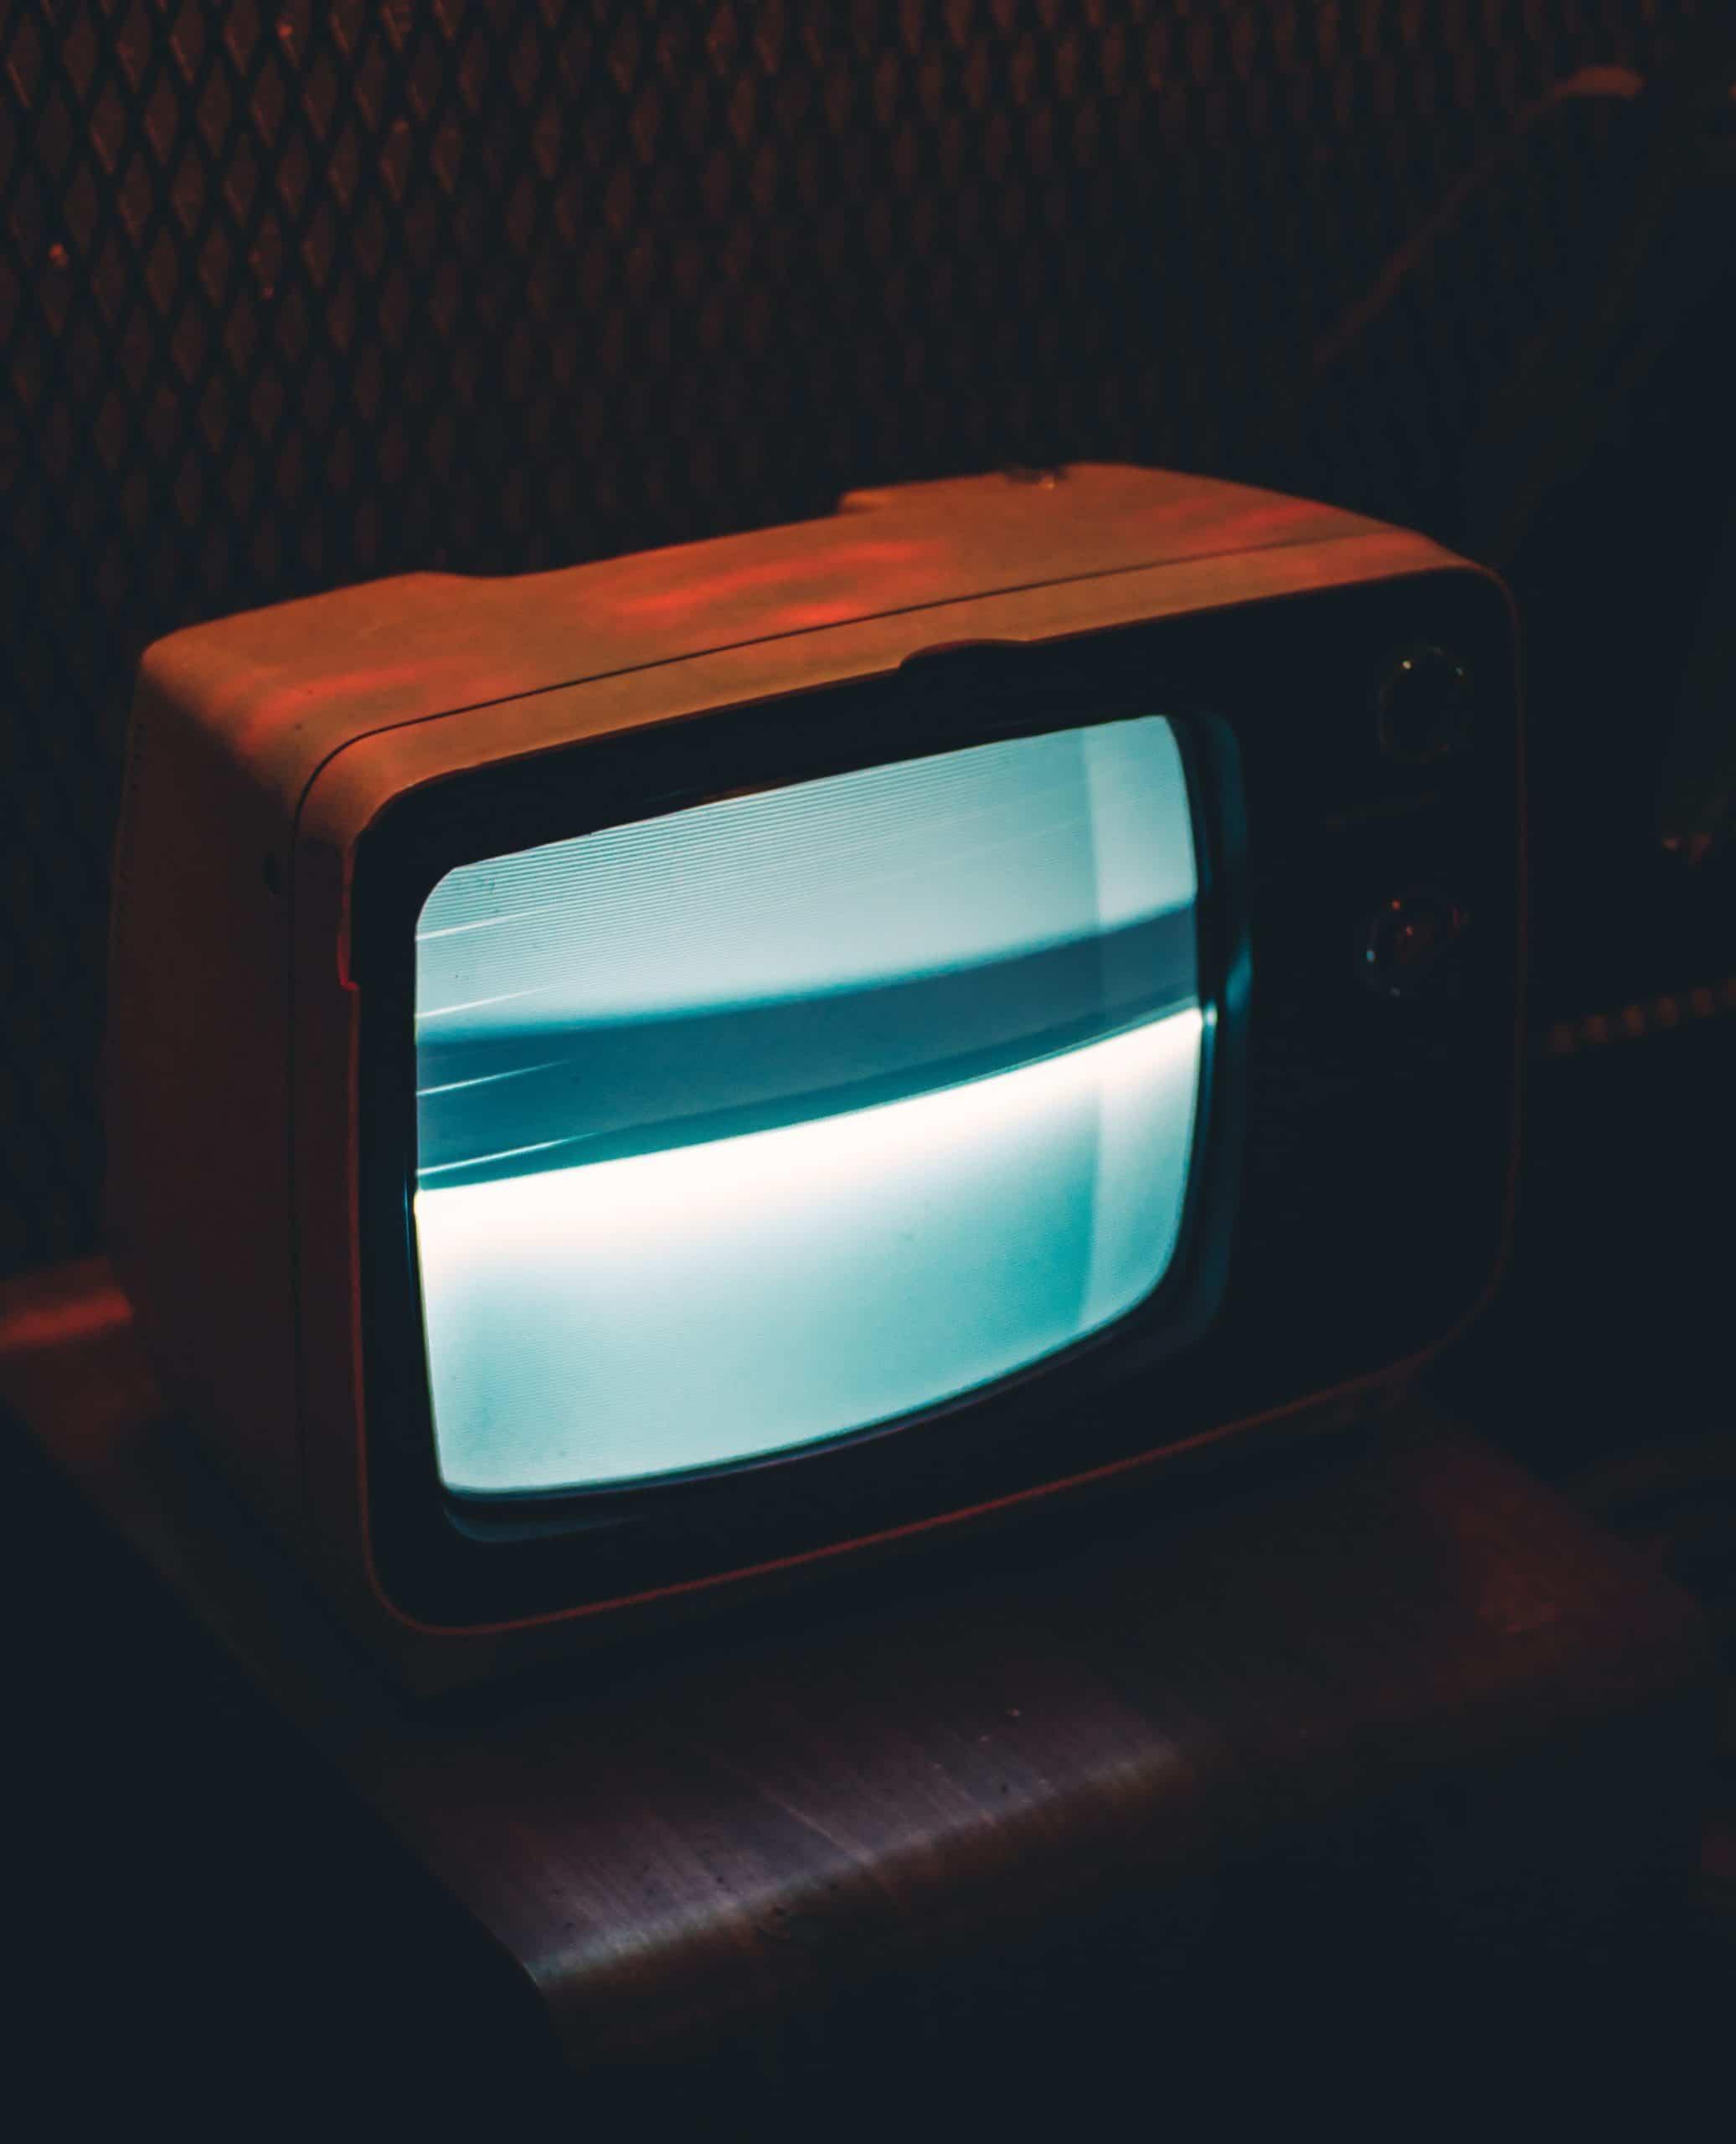 black-crt-tv-showing-gray-screen-704555